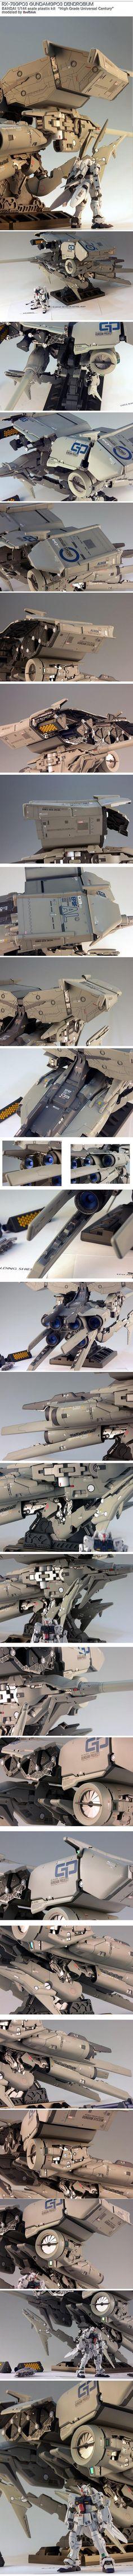 RX-78GP03 Gundam GP03 Dendrobium